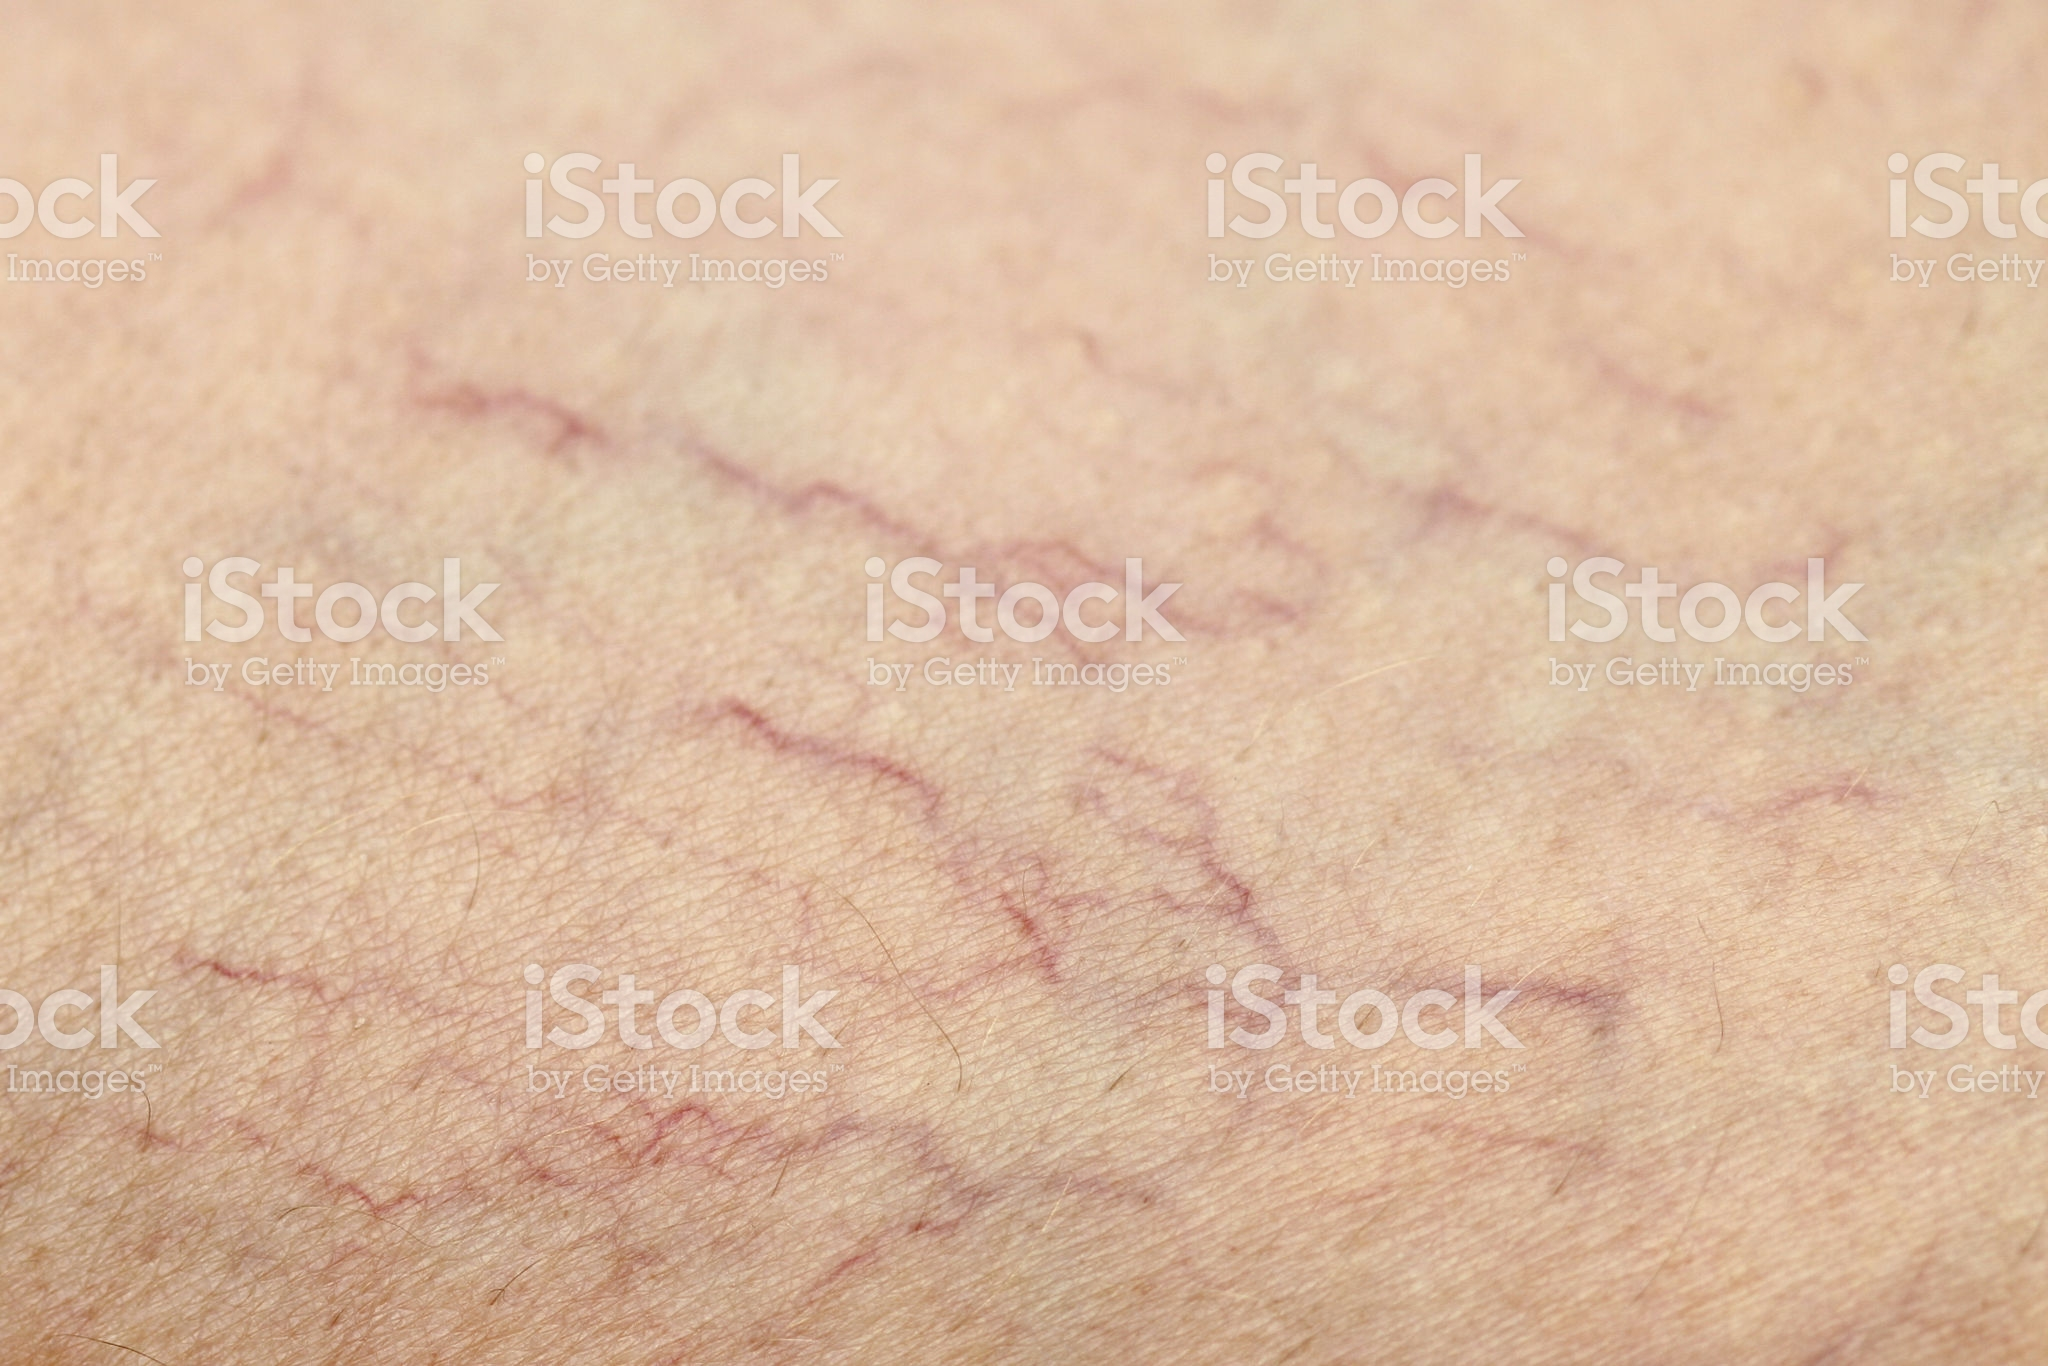 Human Spider Veins on Leg Closeup